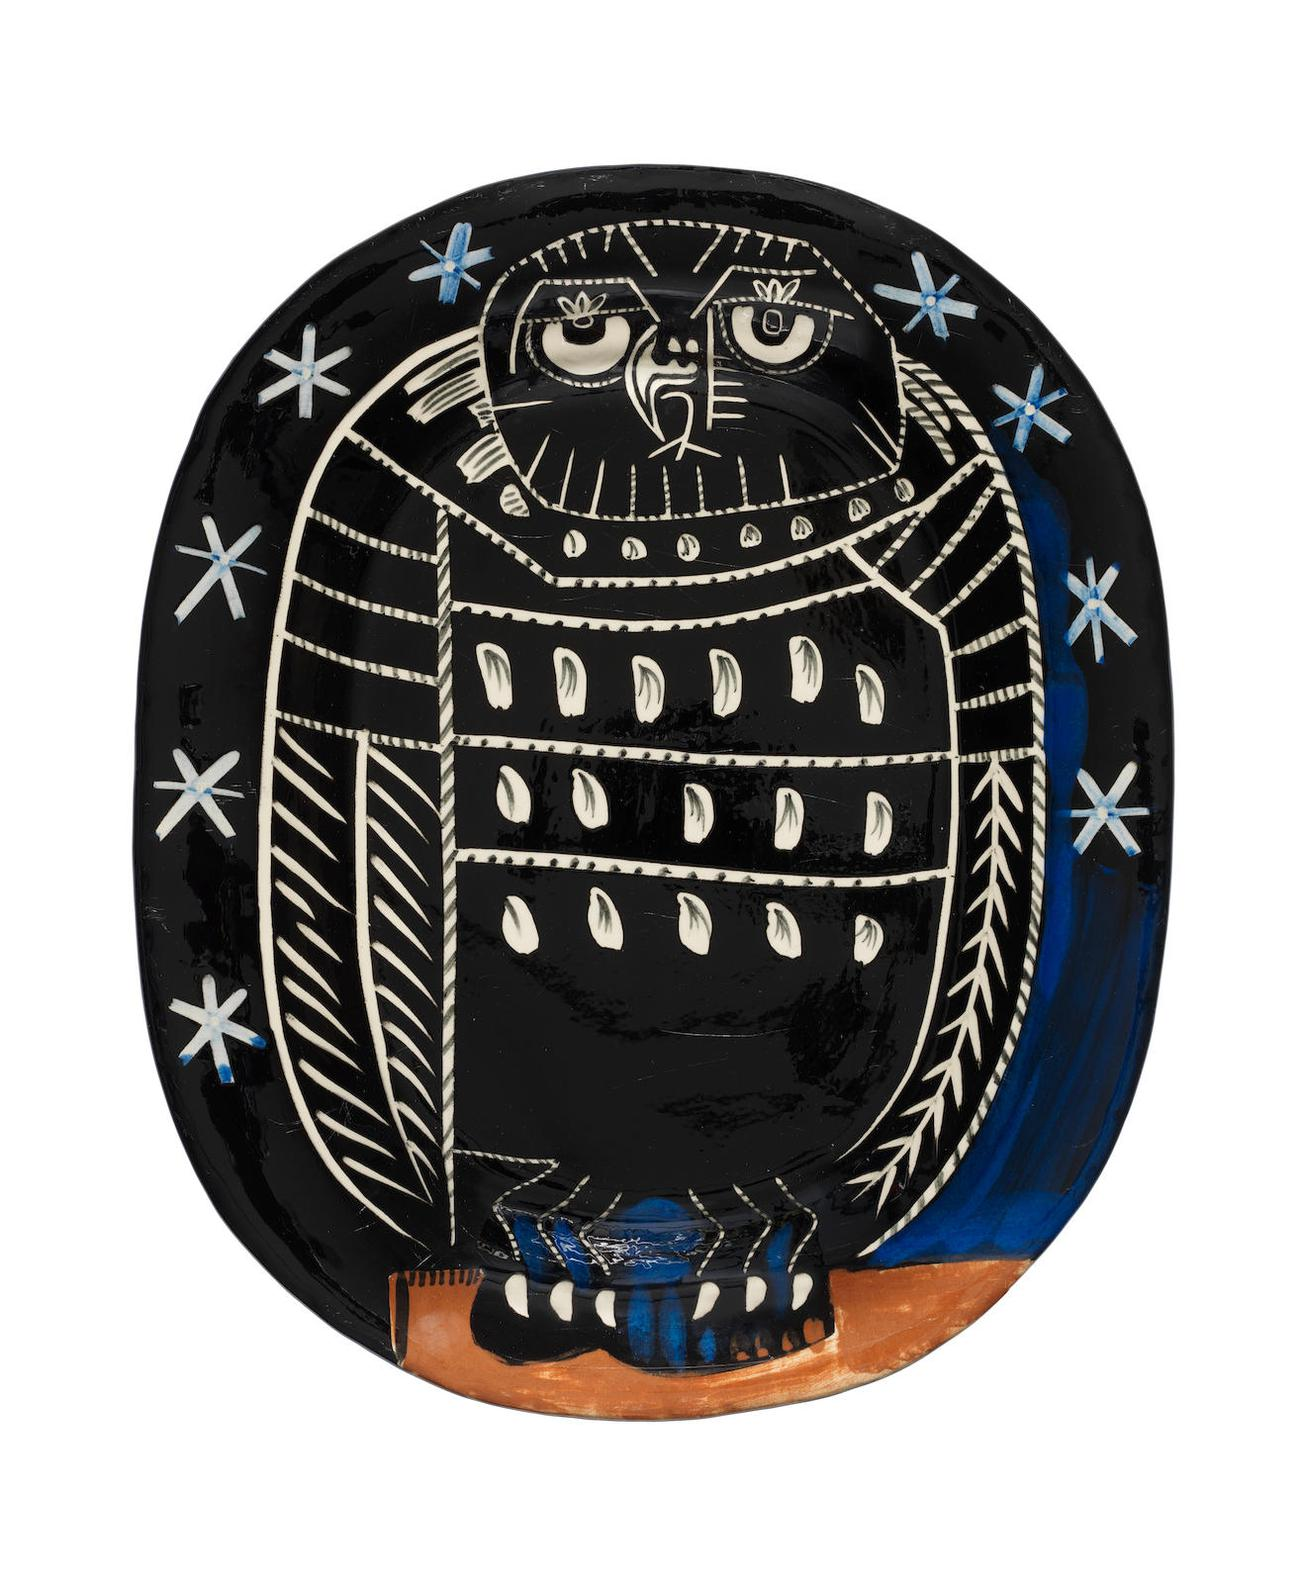 Pablo Picasso-Bright Owl-1955